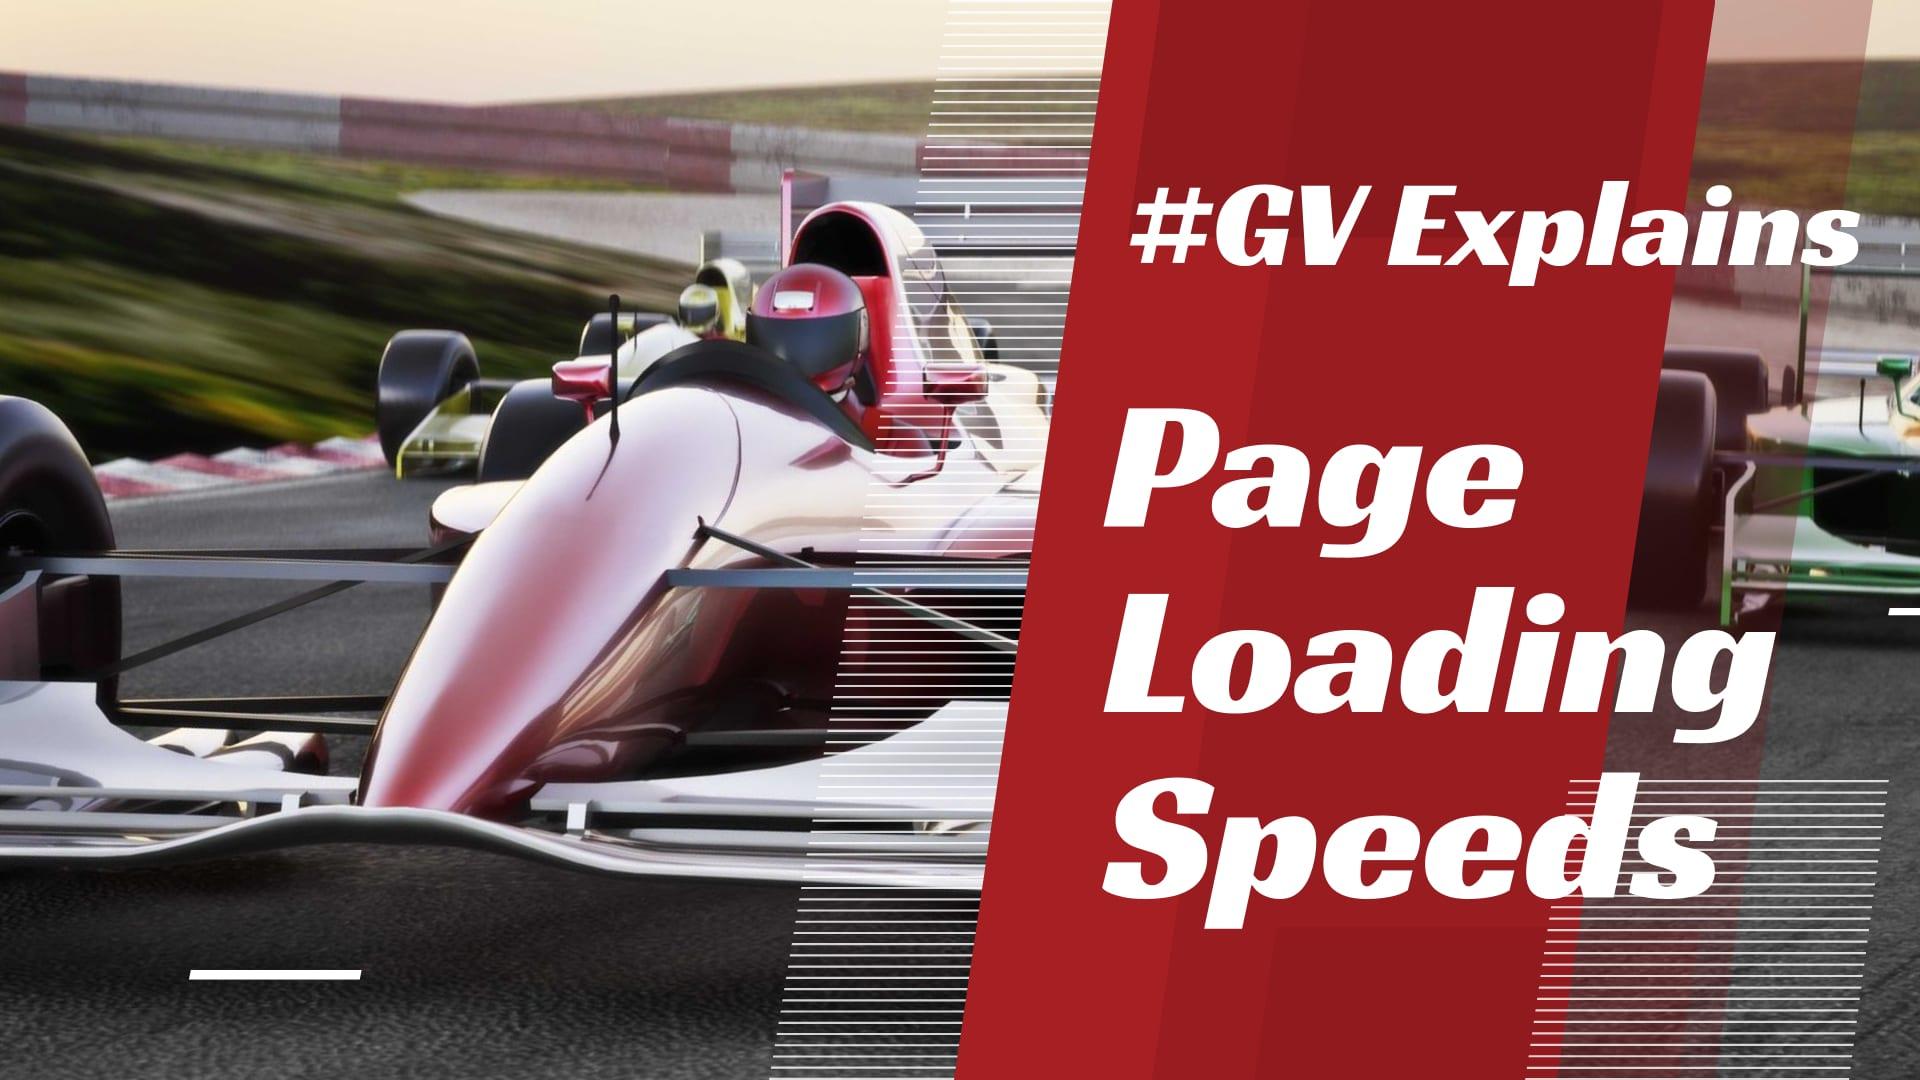 GV Explains Page Loading Speeds